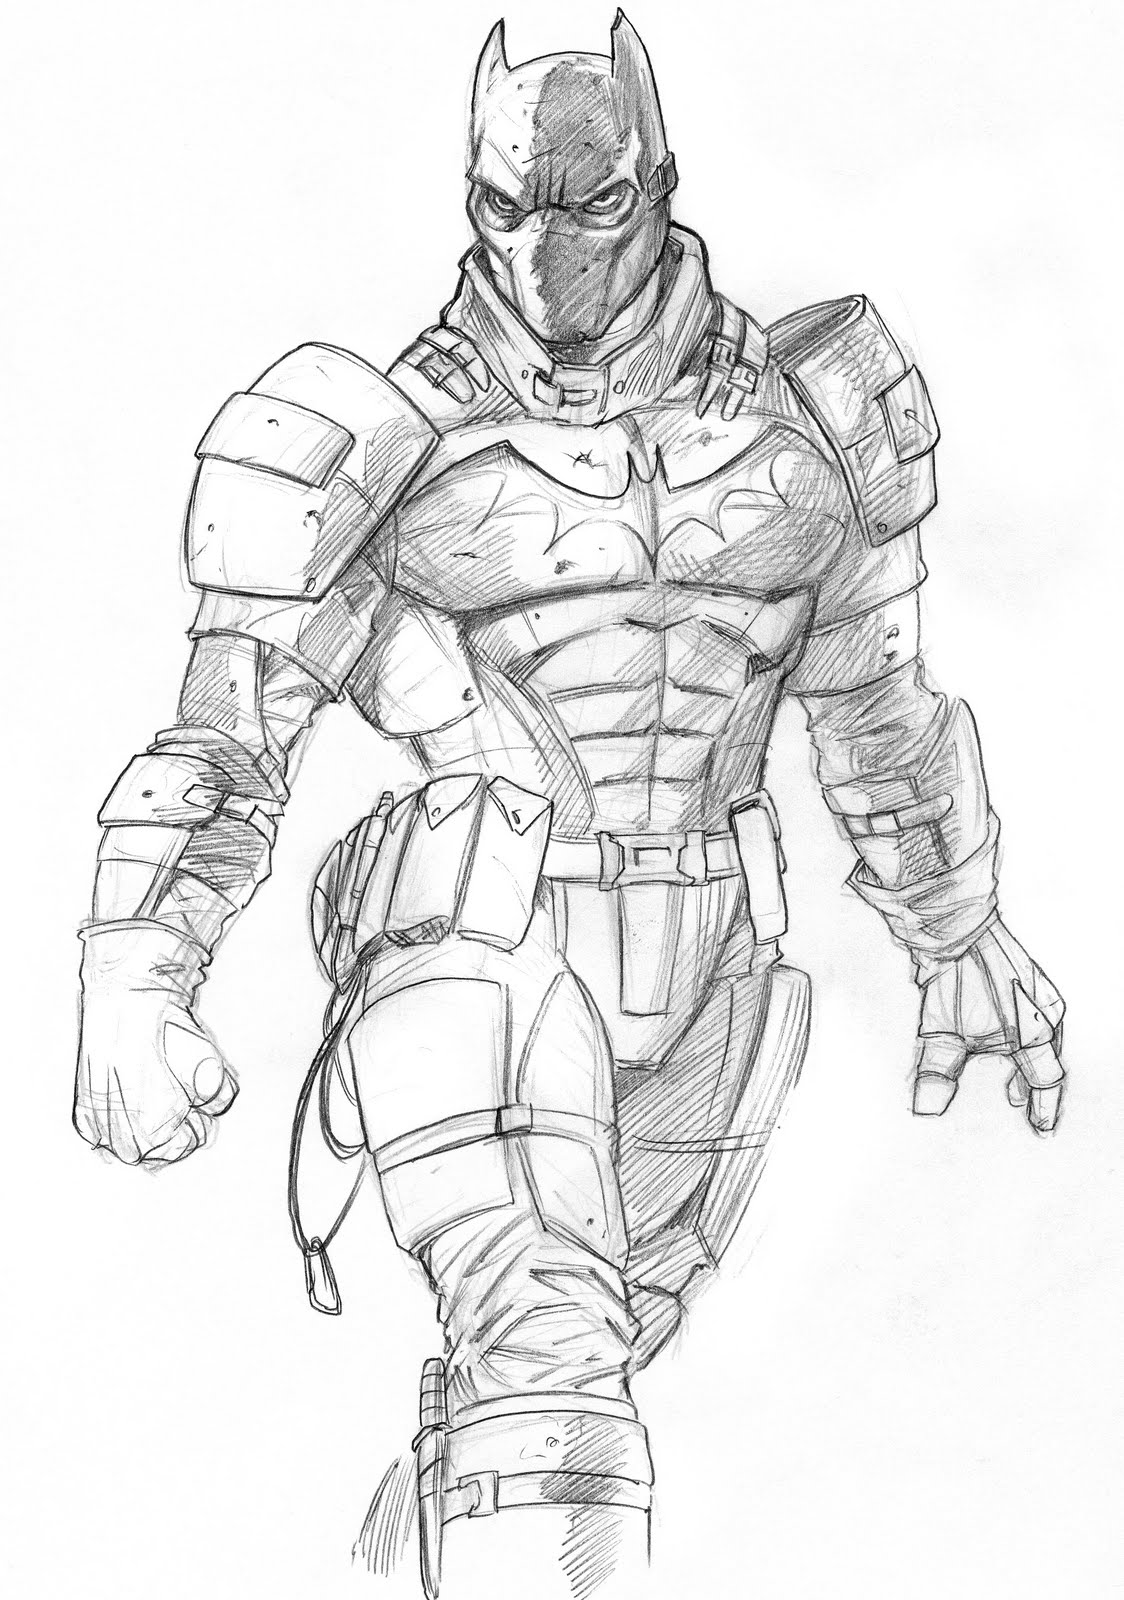 http://1.bp.blogspot.com/-0xxoq2CjUoo/T0VZ54_P0-I/AAAAAAAAAFQ/EWDTR0tQkcA/s1600/Batman+sketch01.jpg